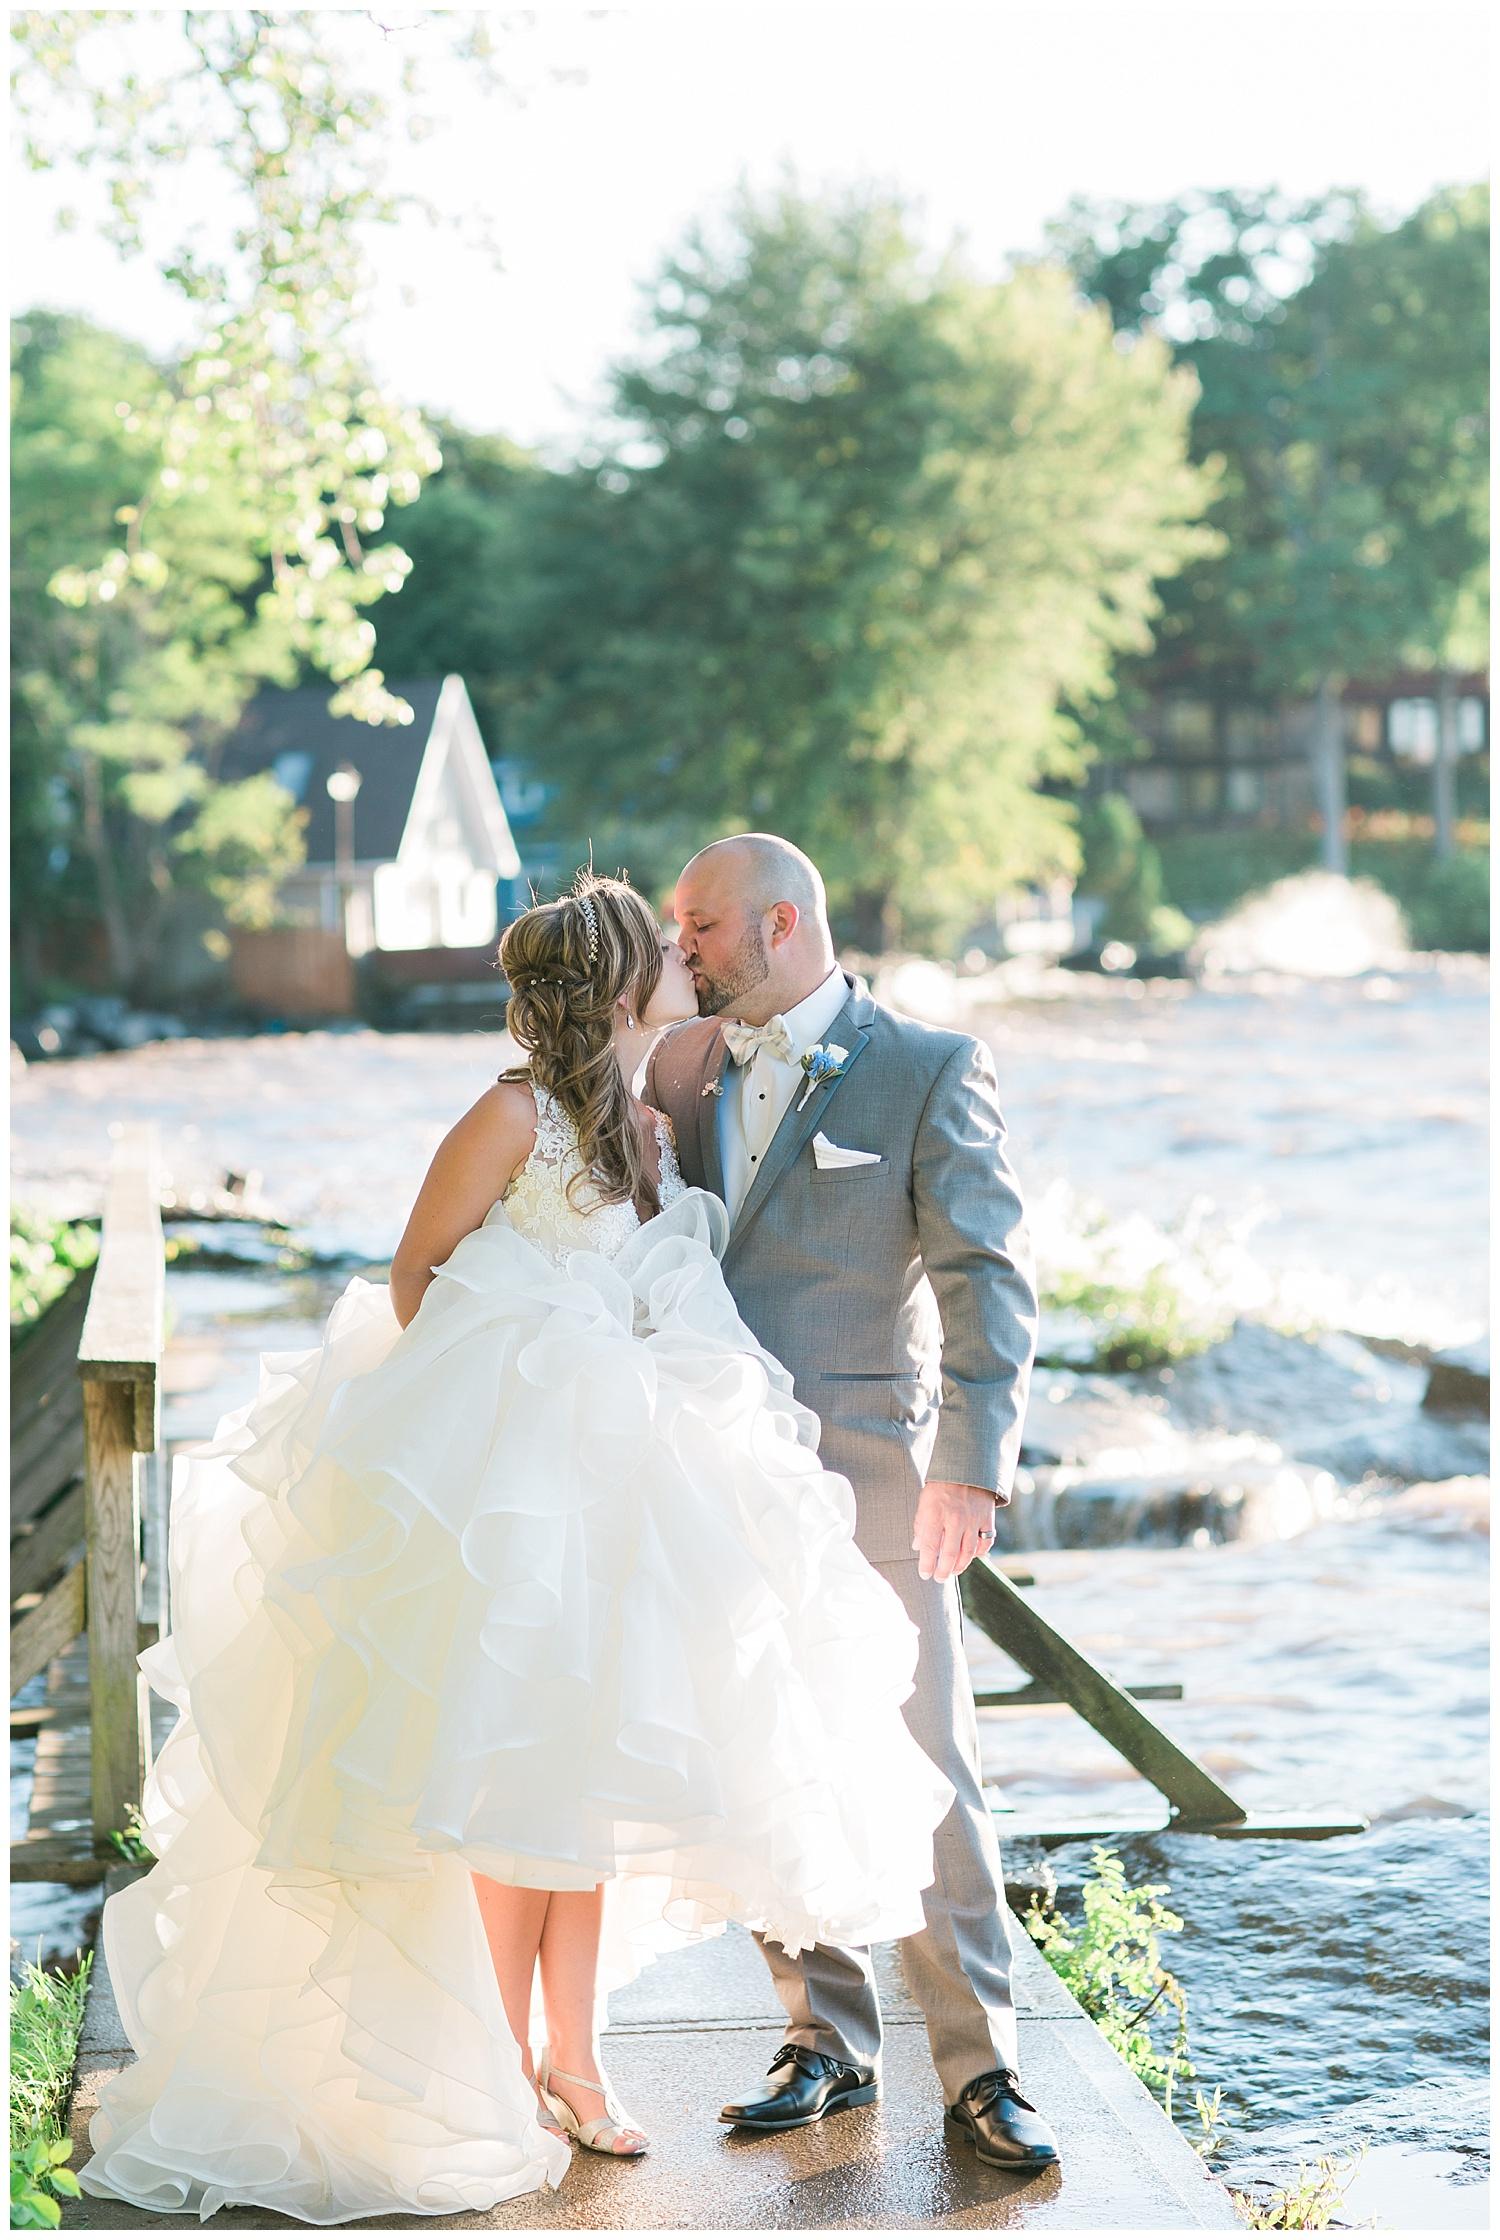 Sean and Andrea - Webster wedding - lass and beau-1227_Buffalo wedding photography.jpg